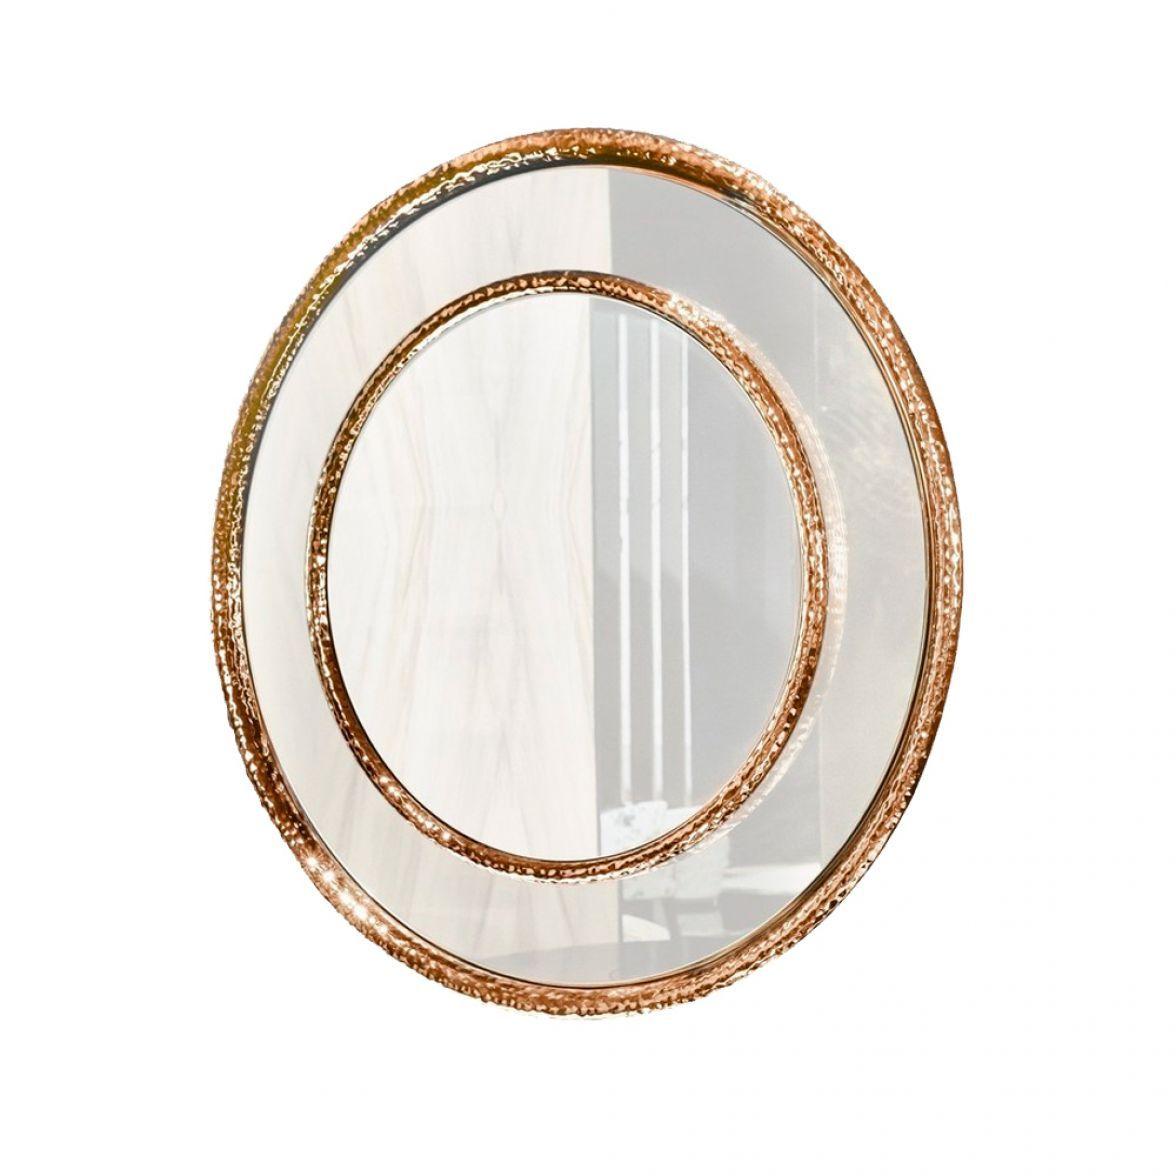 TESEO mirror